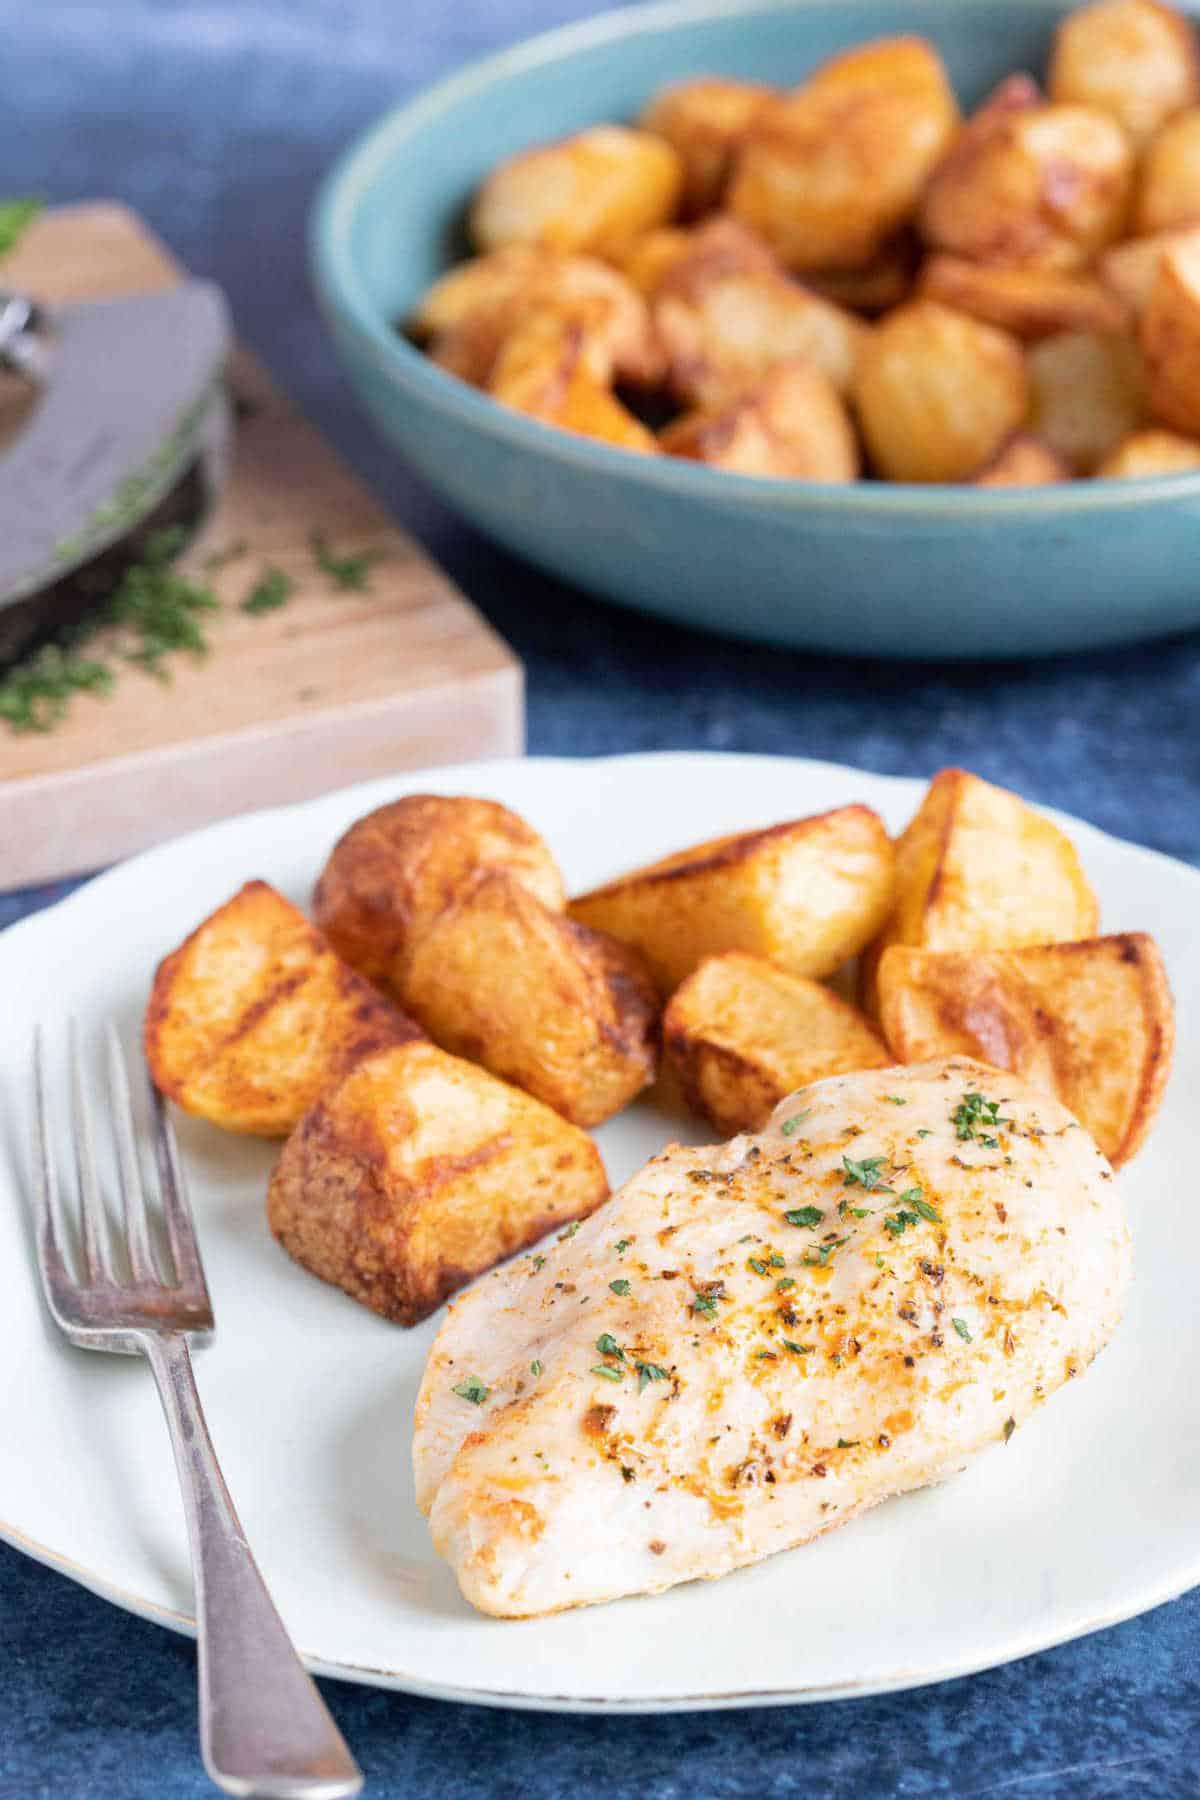 Air fryer Italian chicken breast served with air fryer roast potatoes.